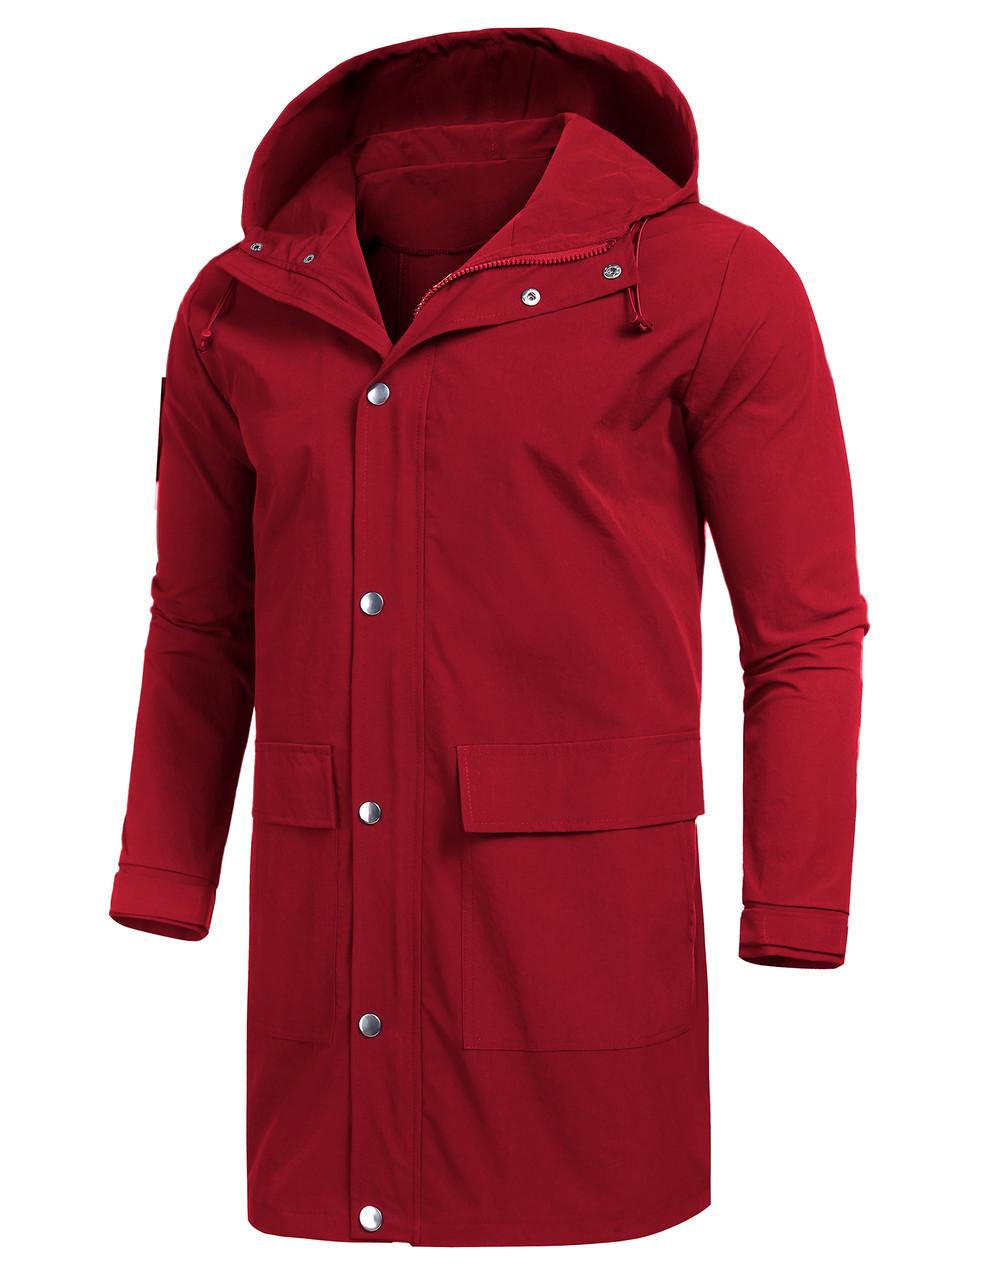 Men/'s Raincoat Lightweight Casual Hooded Rain Coat Long Jacket Coat Waterproof